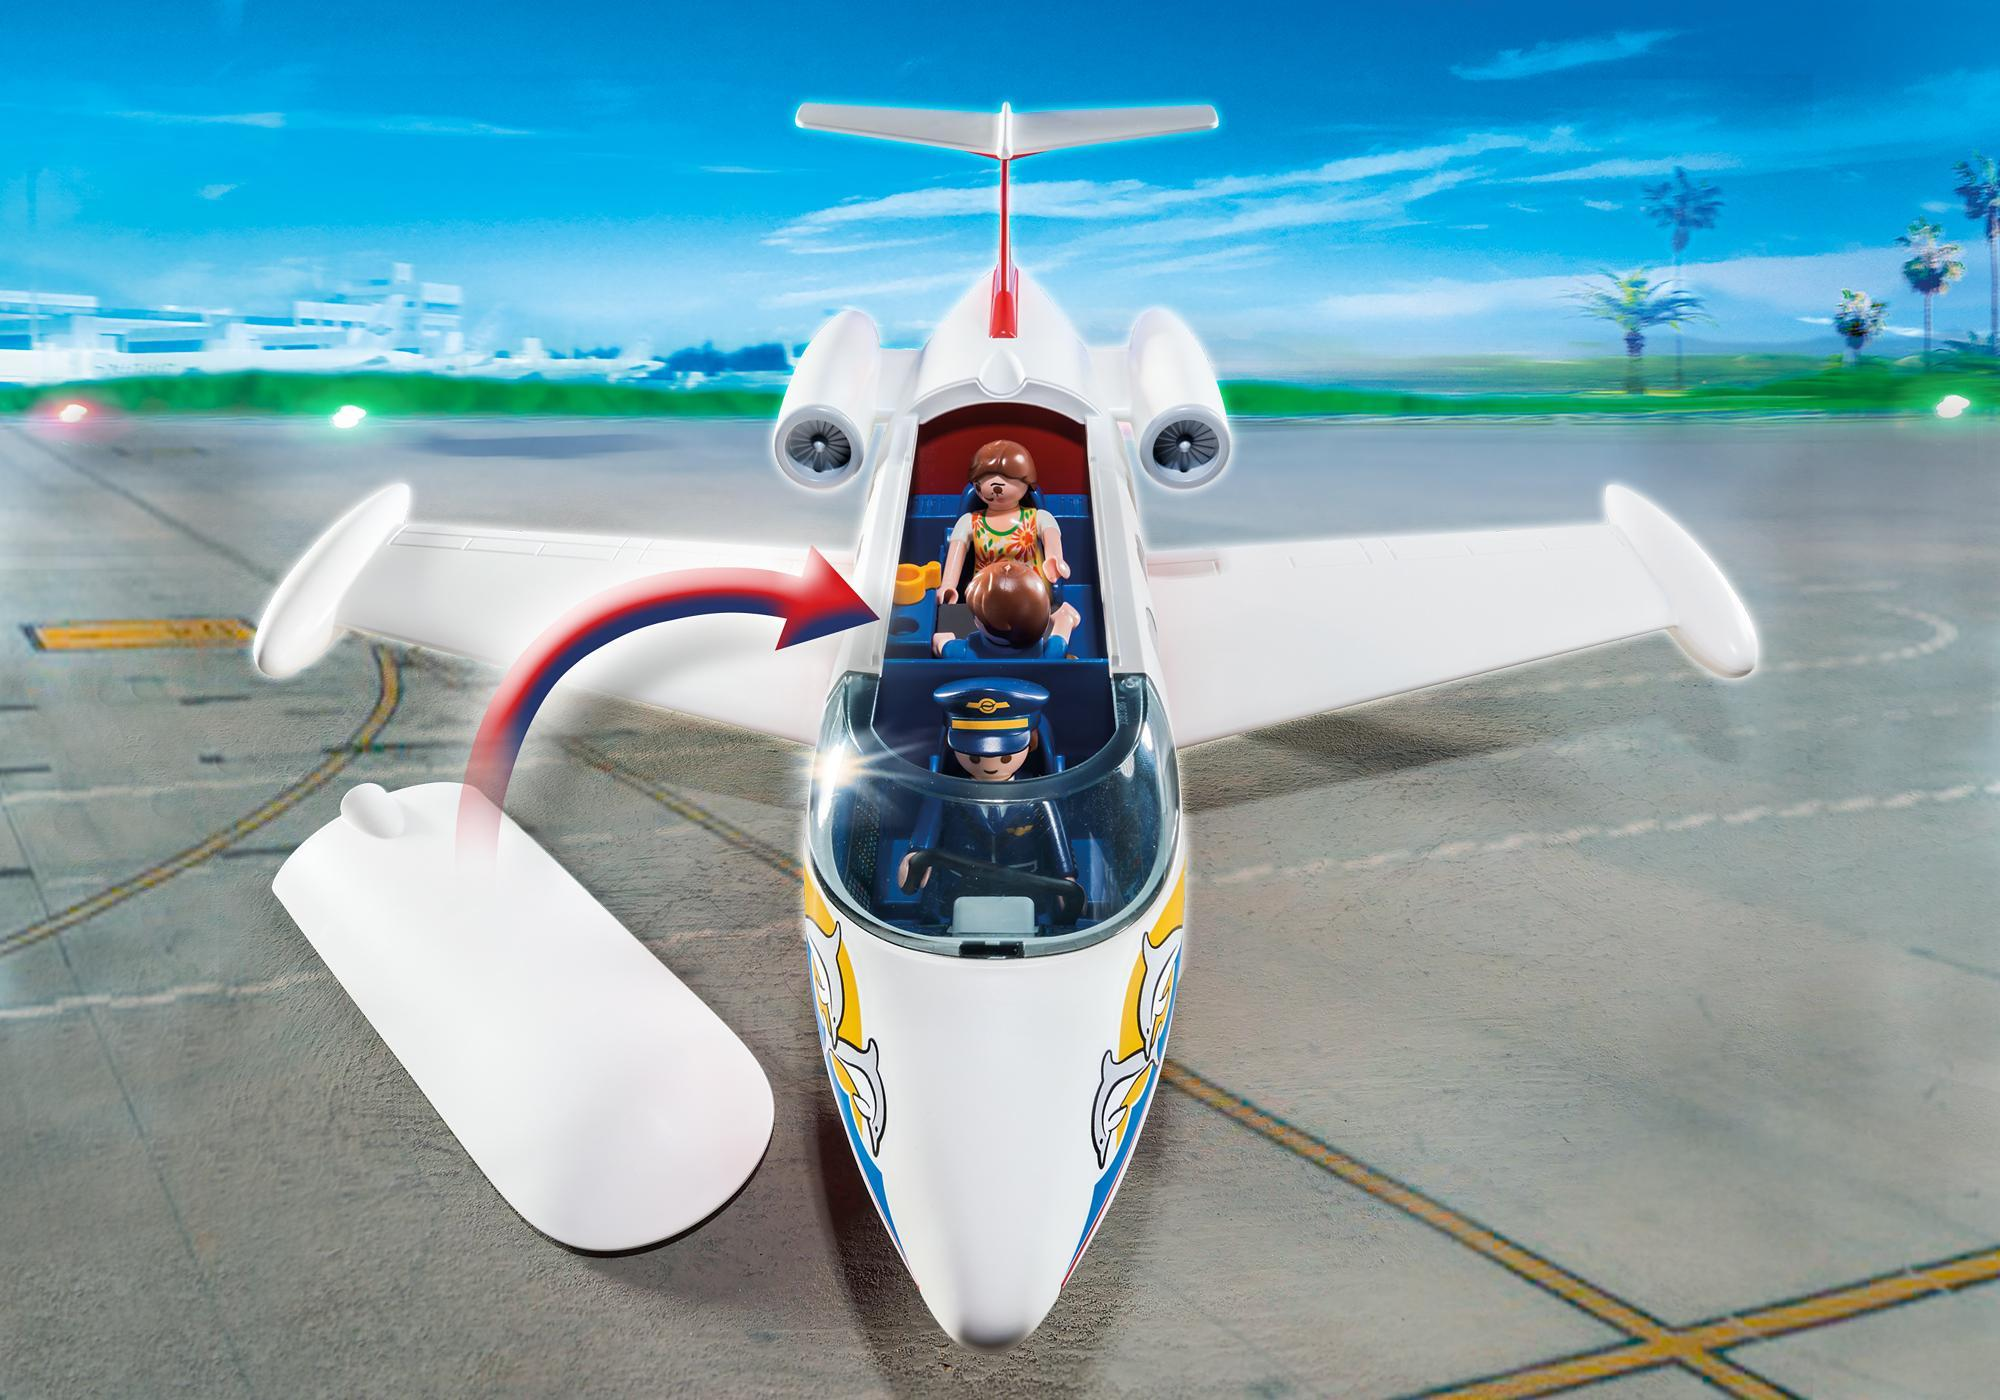 http://media.playmobil.com/i/playmobil/6081_product_extra1/Avión de Vacaciones